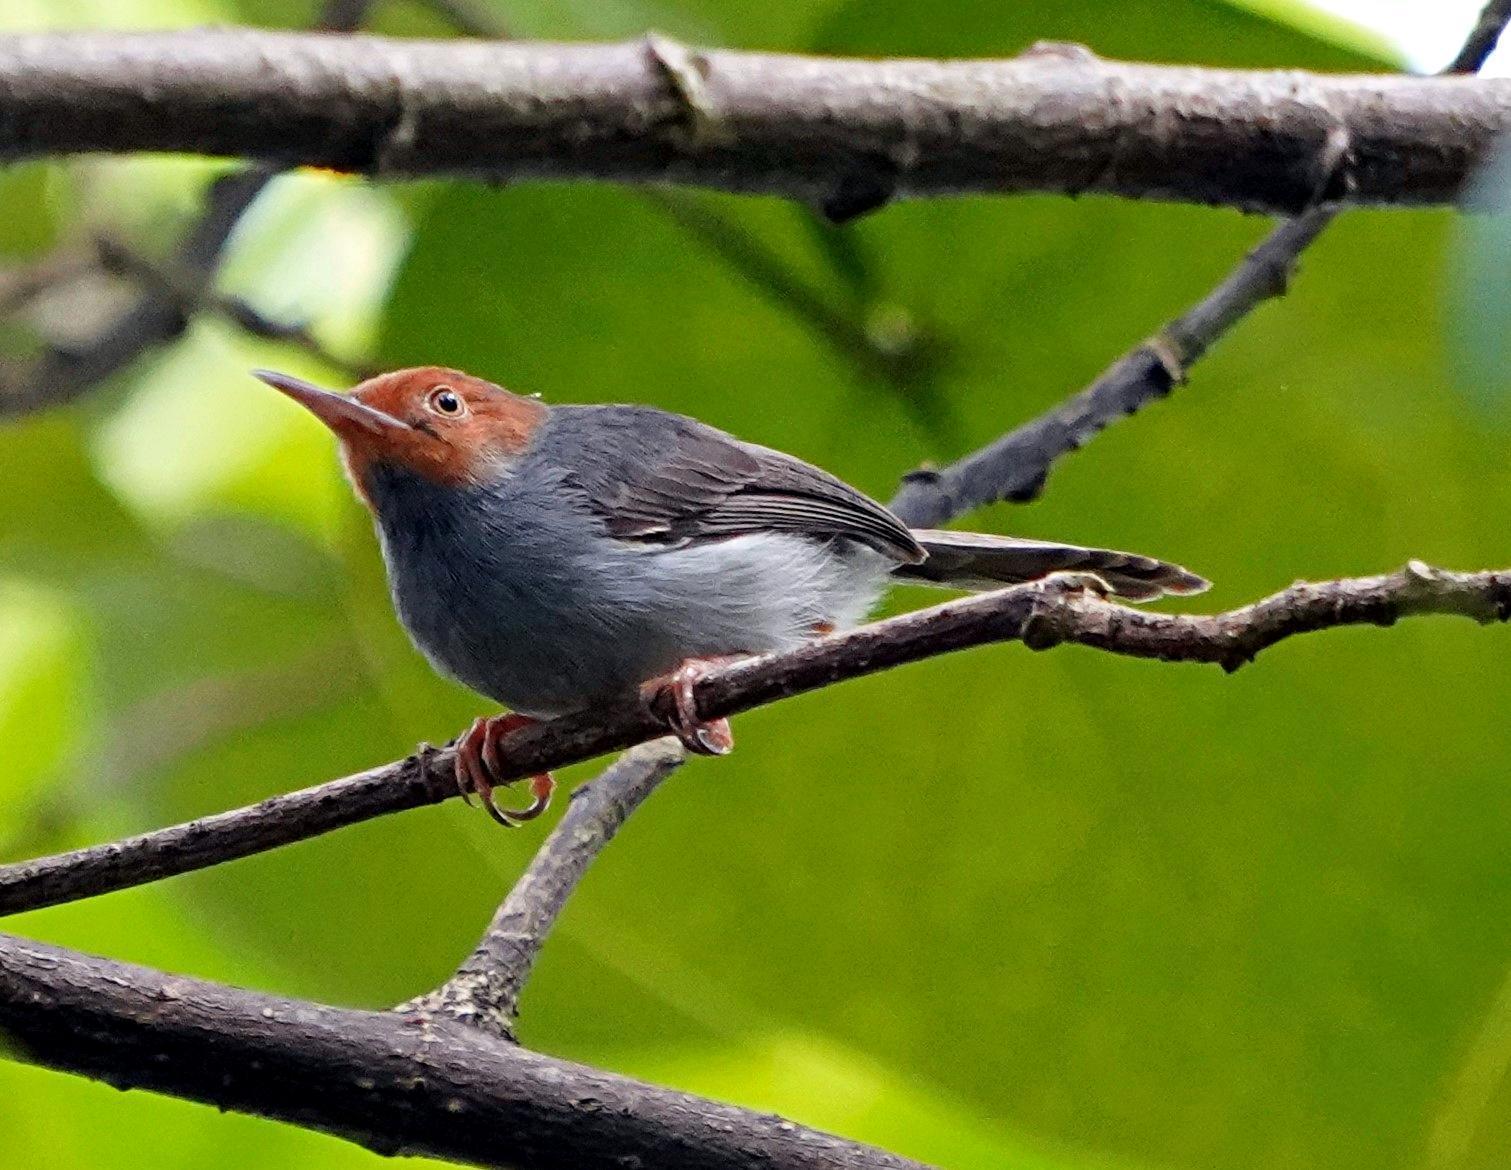 Ashy Tailorbird Photo by Steven Cheong